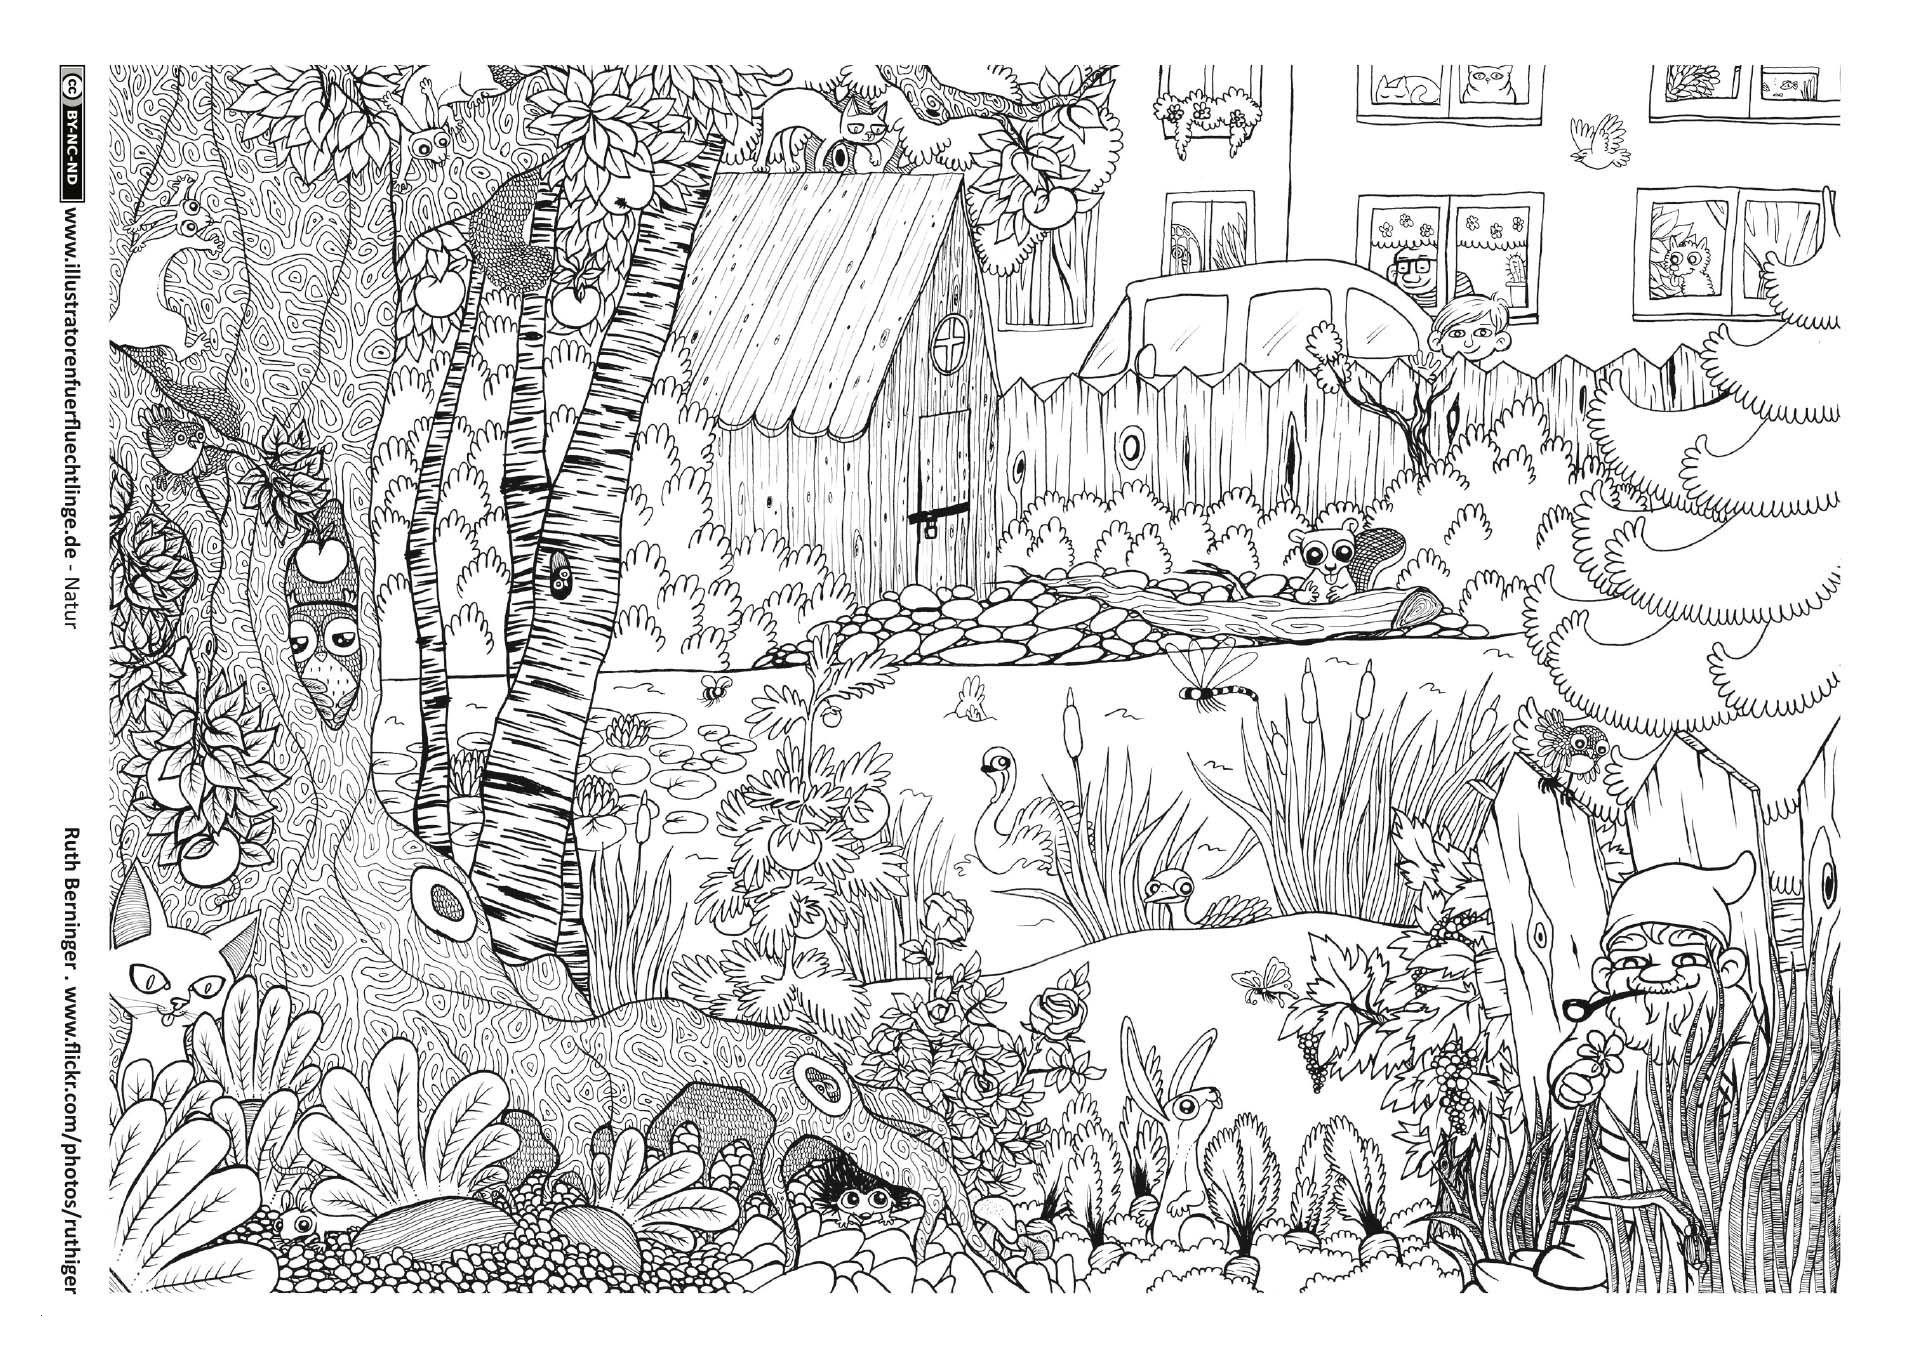 Ausmalbilder Herbst Pilze Frisch Garten Tiere Wimmelbild … Schule Pinterest Genial Malvorlagen Herbst Bild